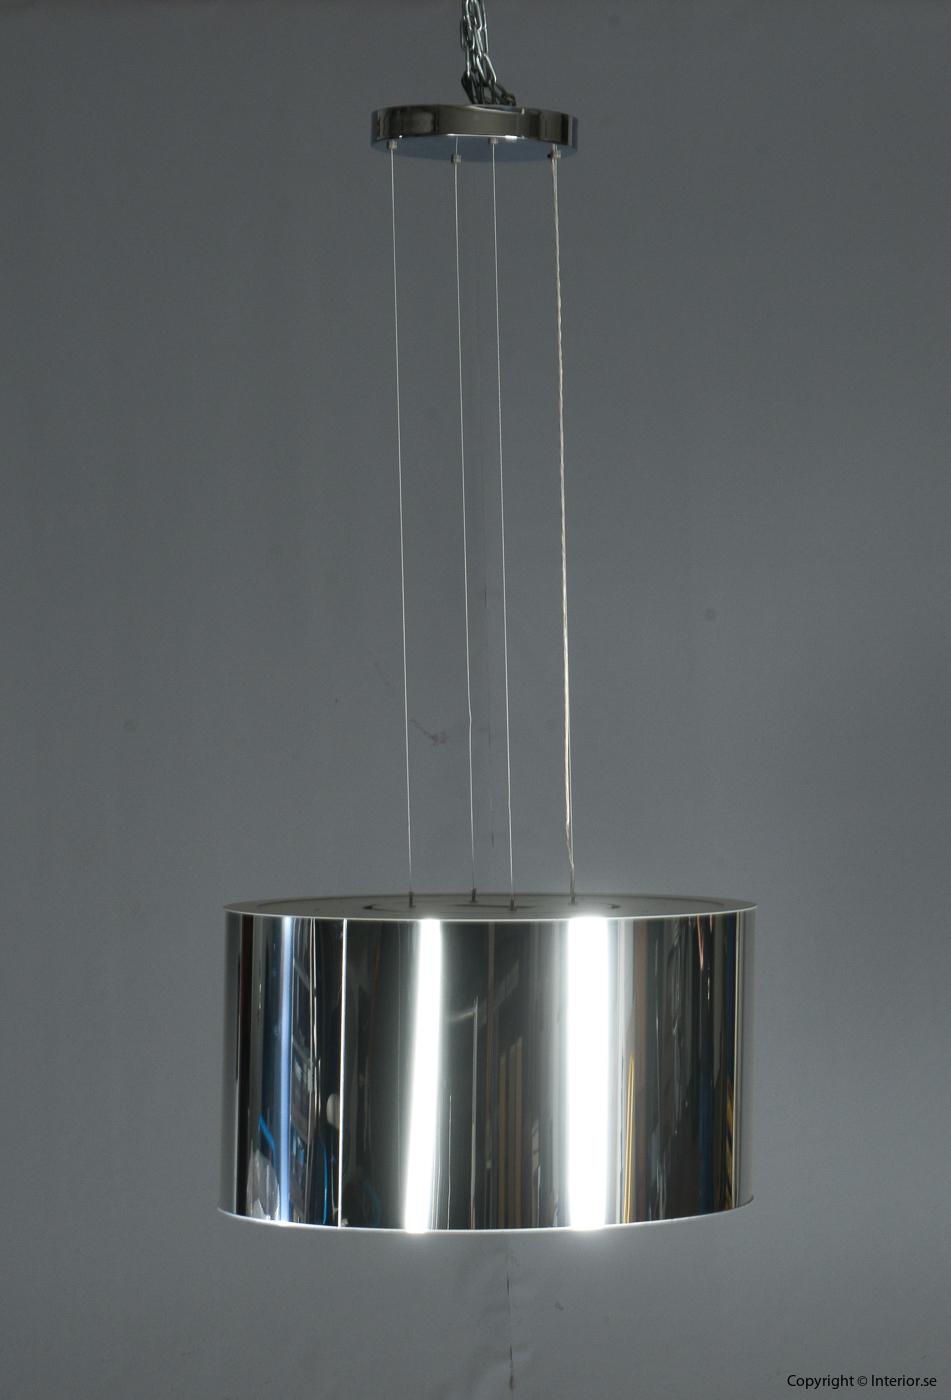 Pendel suspended lamp, Artemide Tian Xia 80 cm - Carlotta de Bevilacqua 7